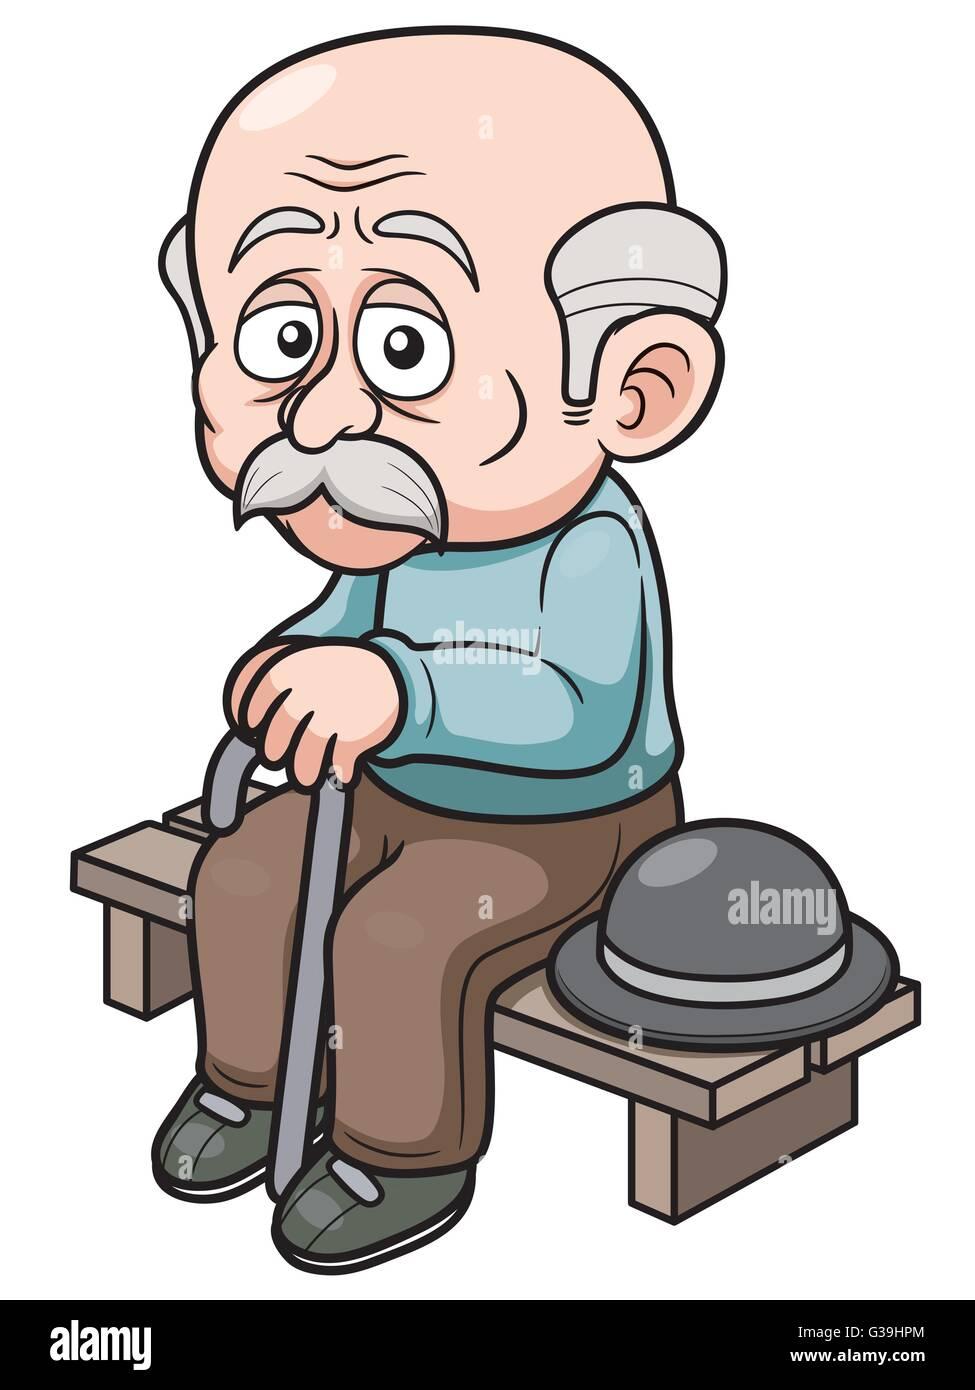 vector illustration of cartoon old man sitting bench stock vector rh alamy com Happy Old Man Cartoon Happy Old Man Cartoon